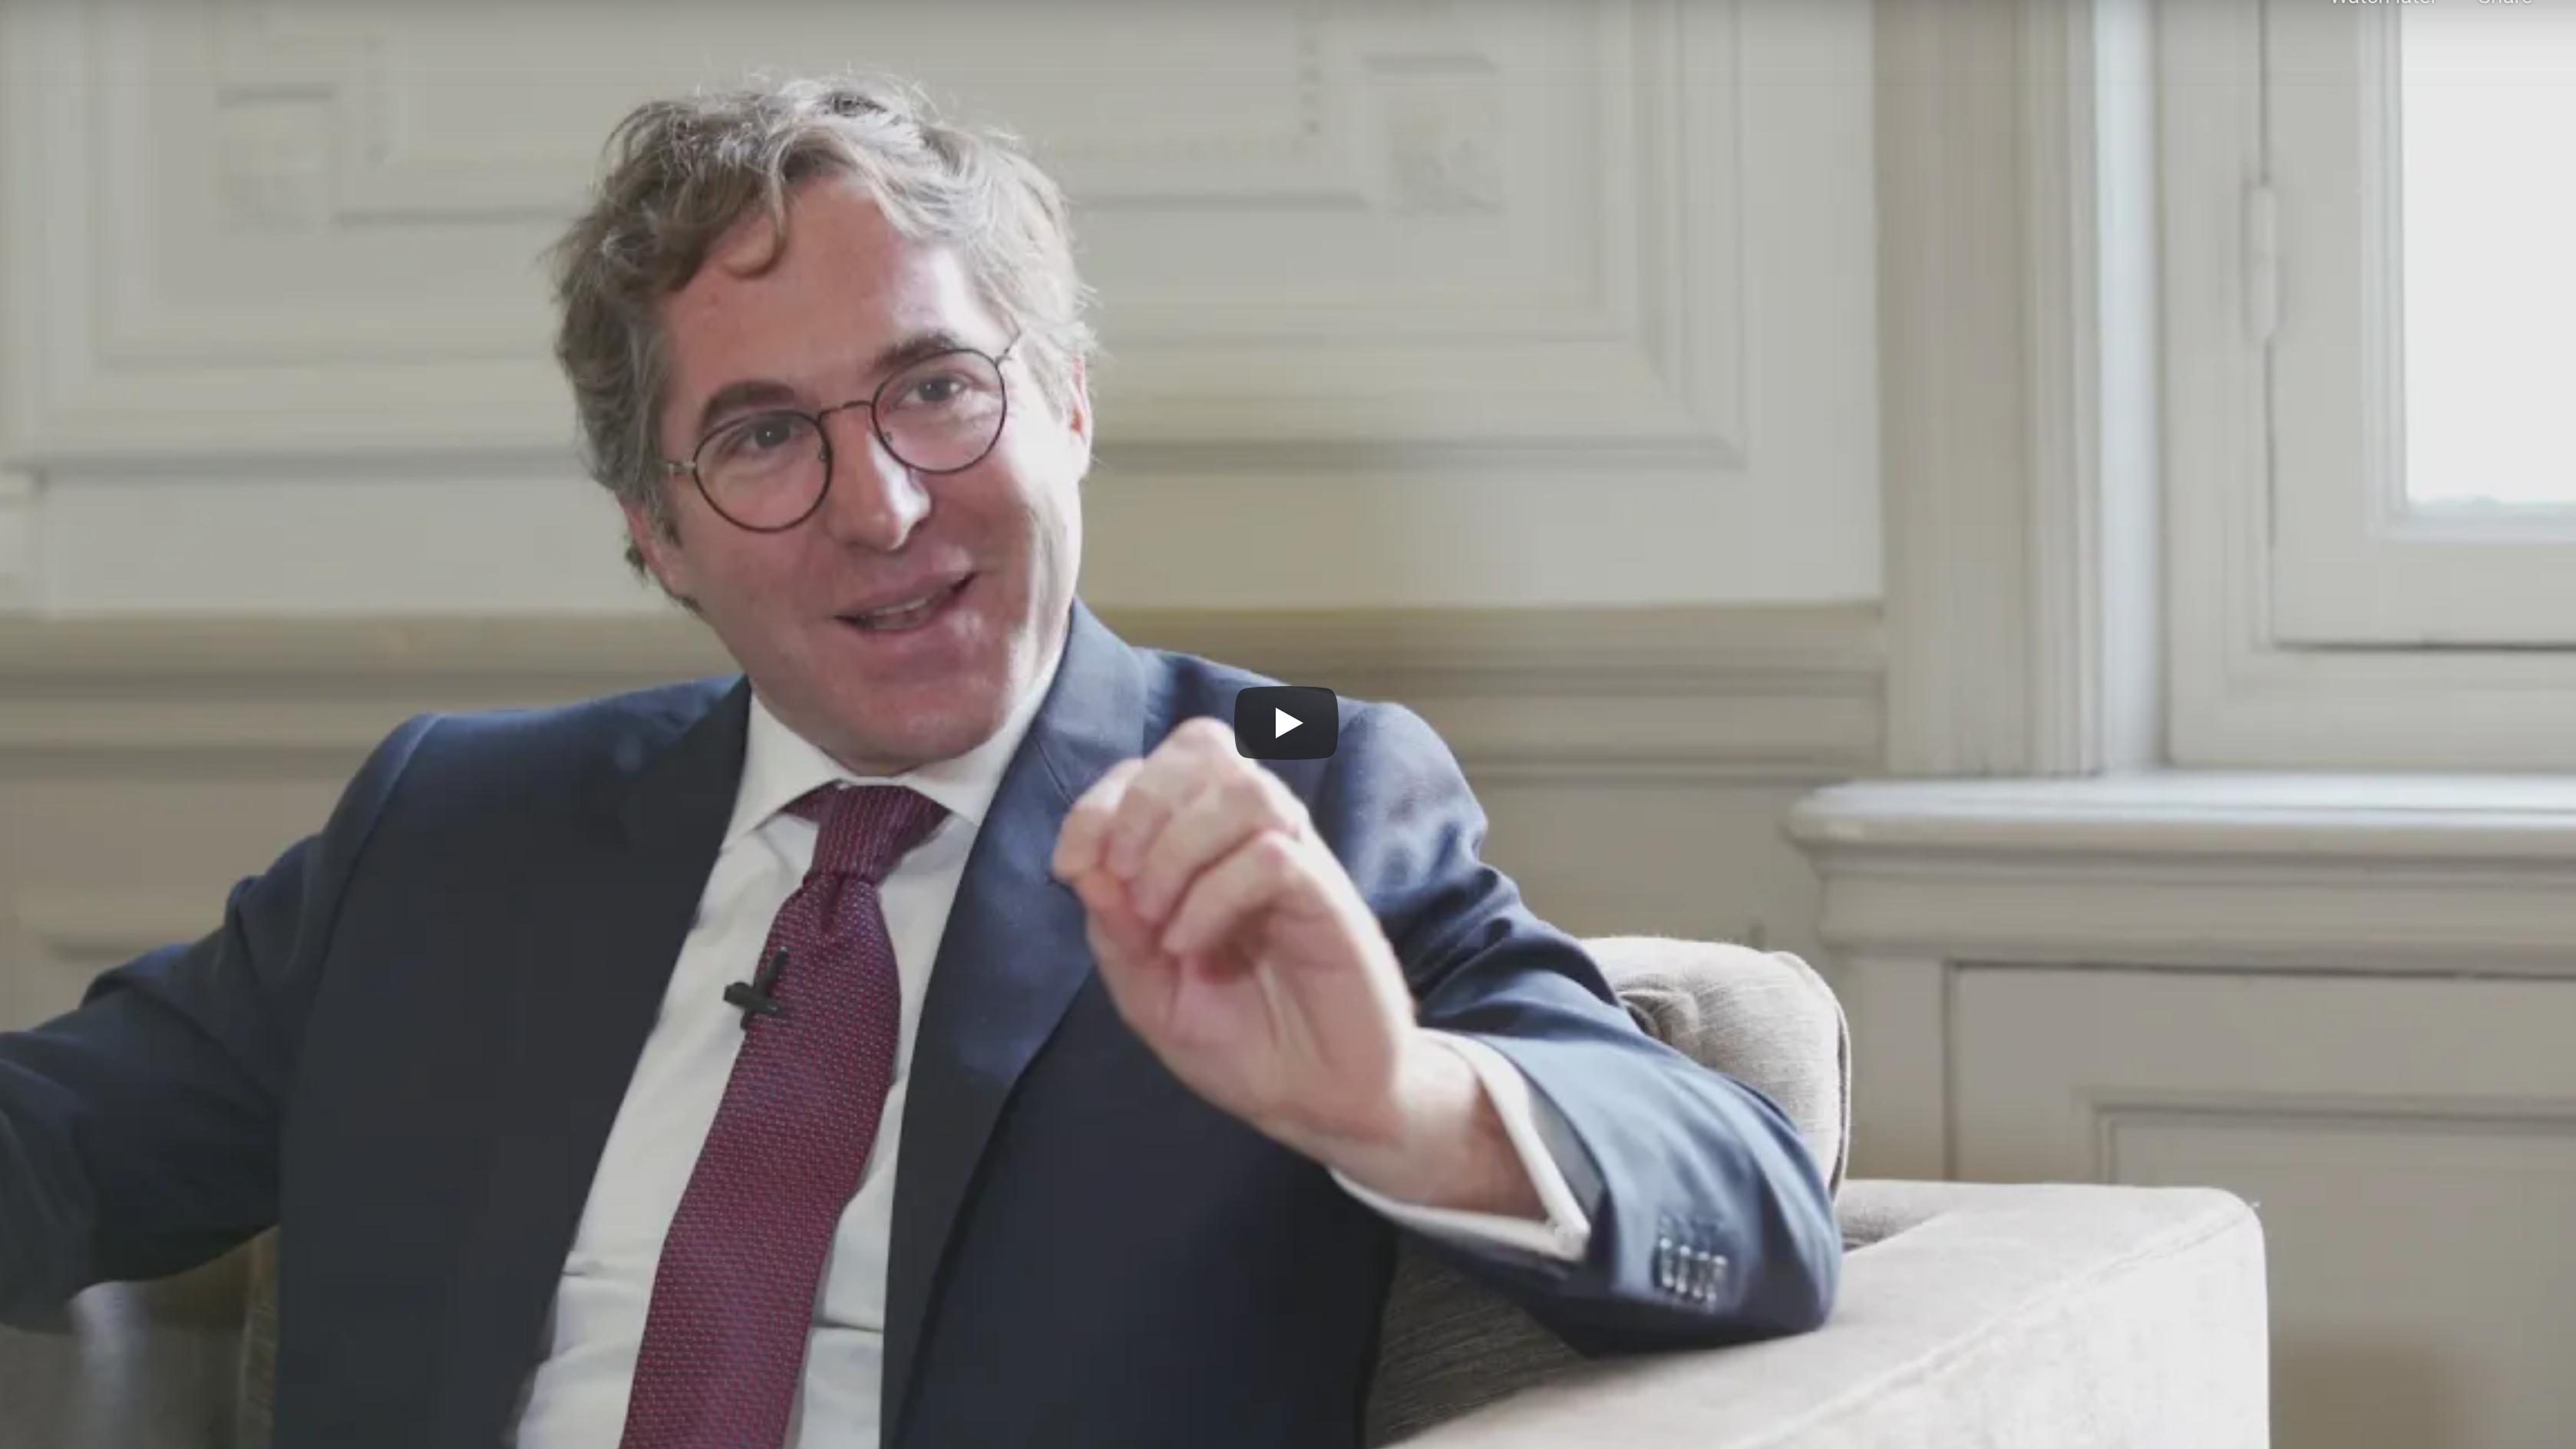 Simon Greenberg video